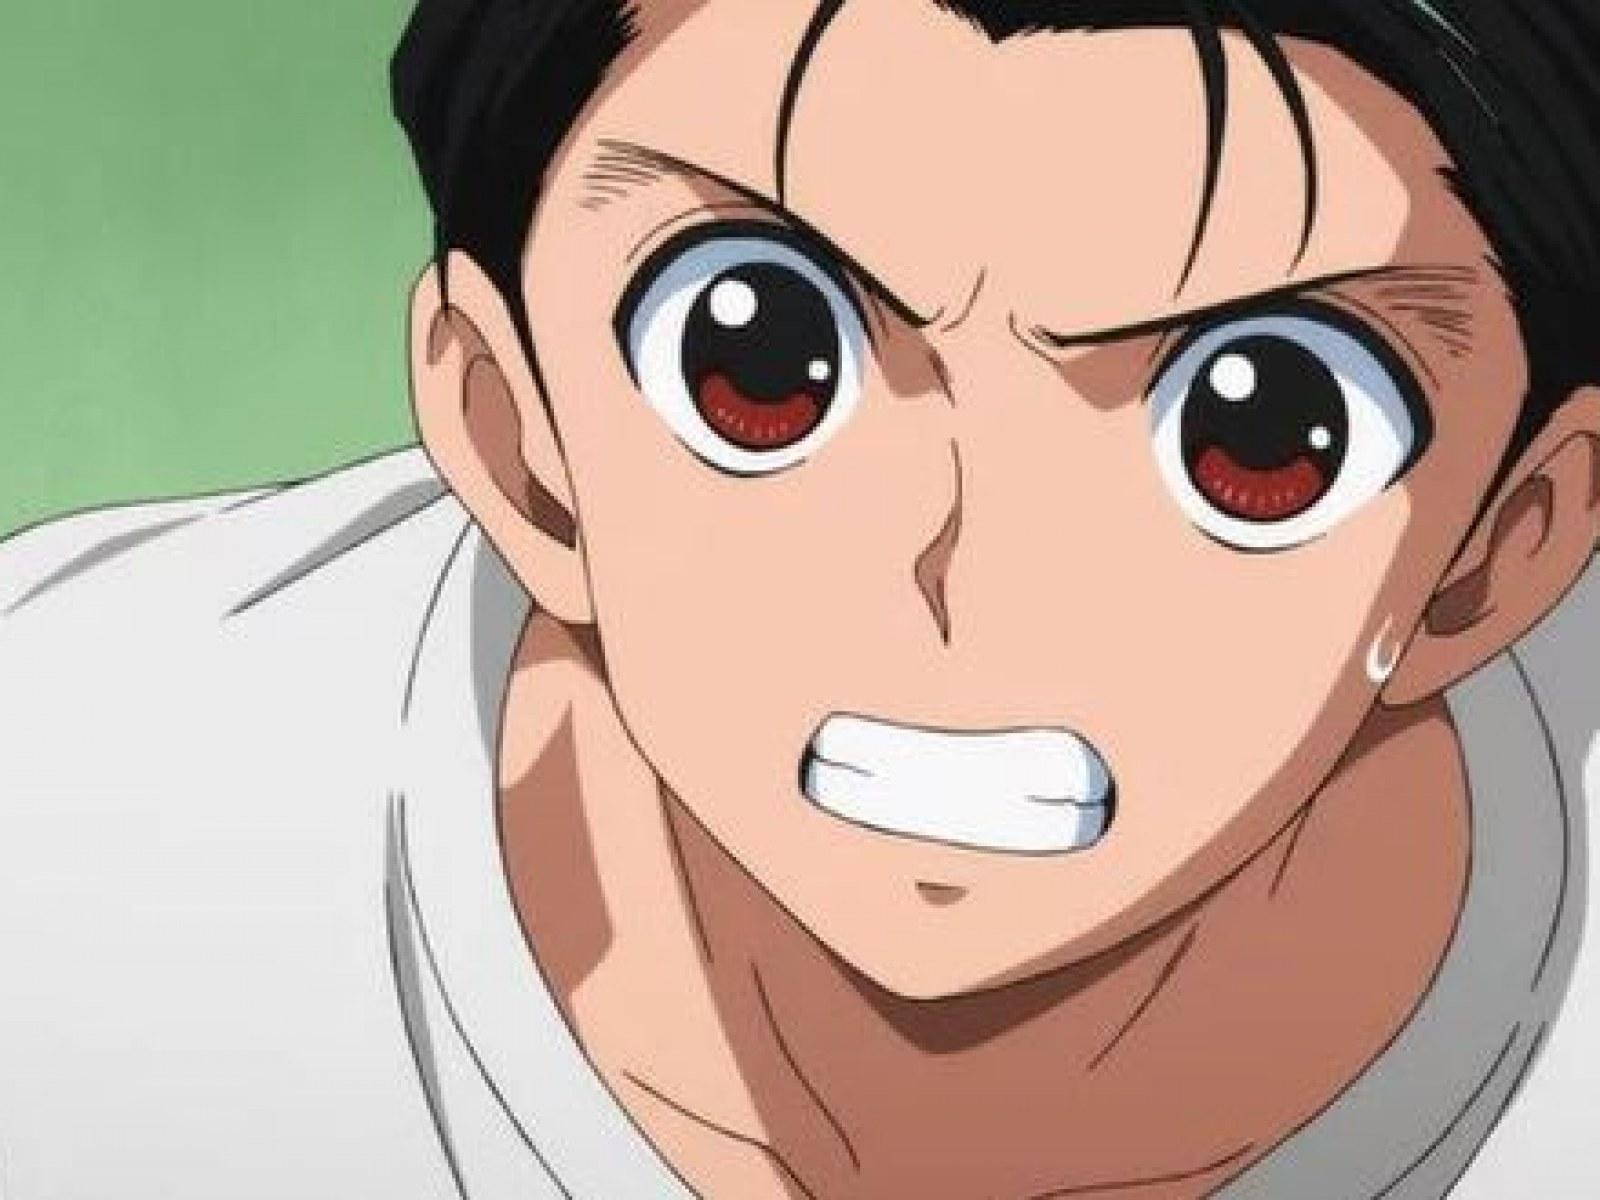 New Yu Yu Hakusho Anime Screenshots Give First Look At Yusuke Kuwabara And More